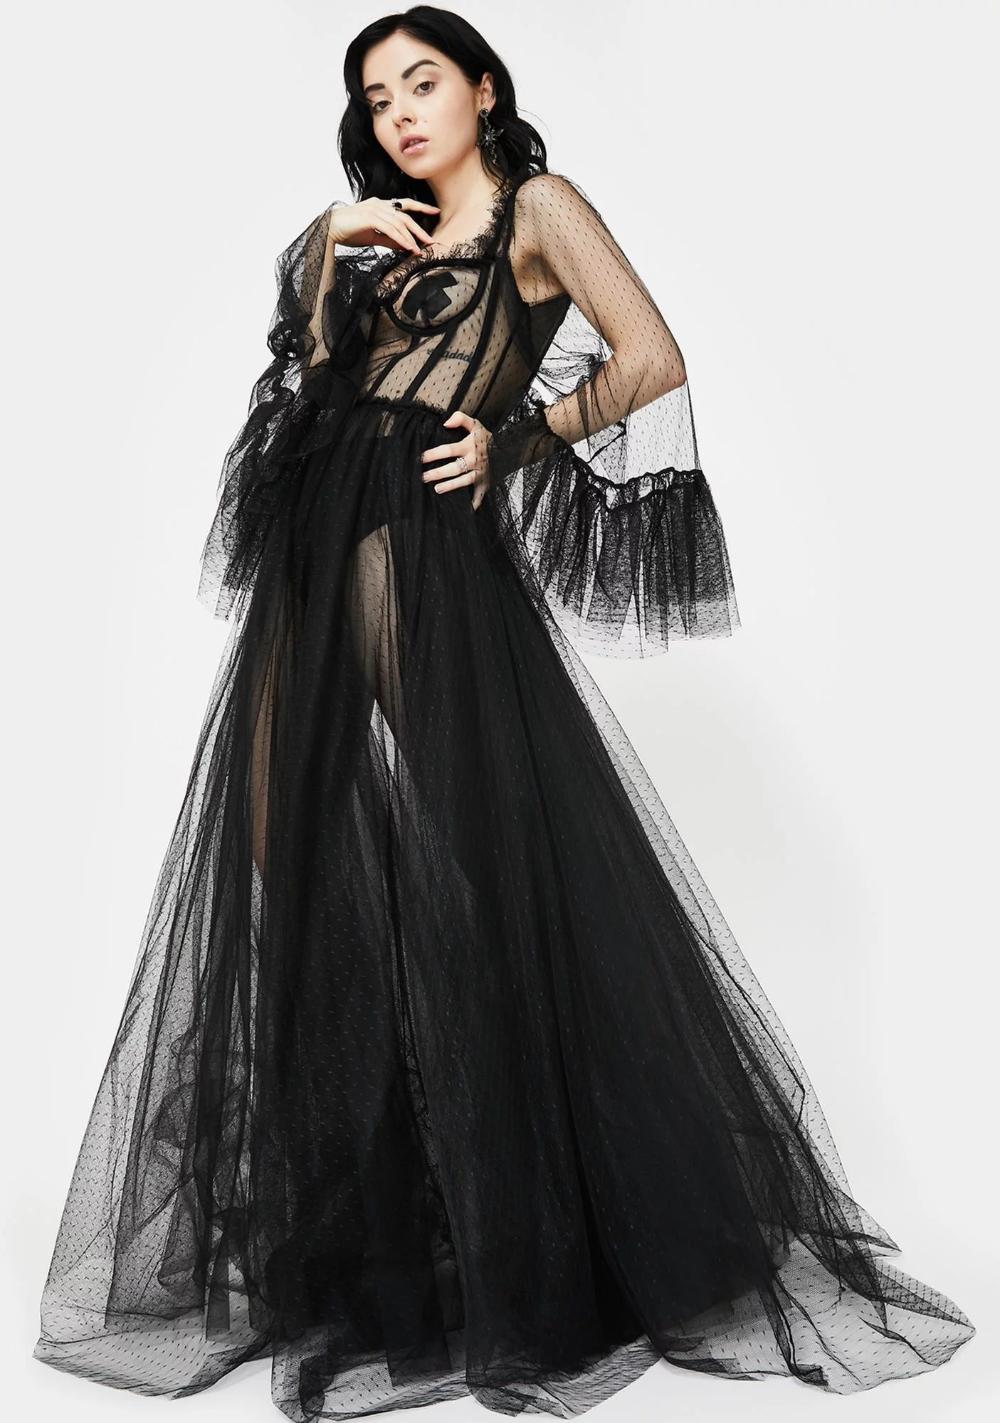 Haunting Beloved Tulle Dress #blackmaxidress